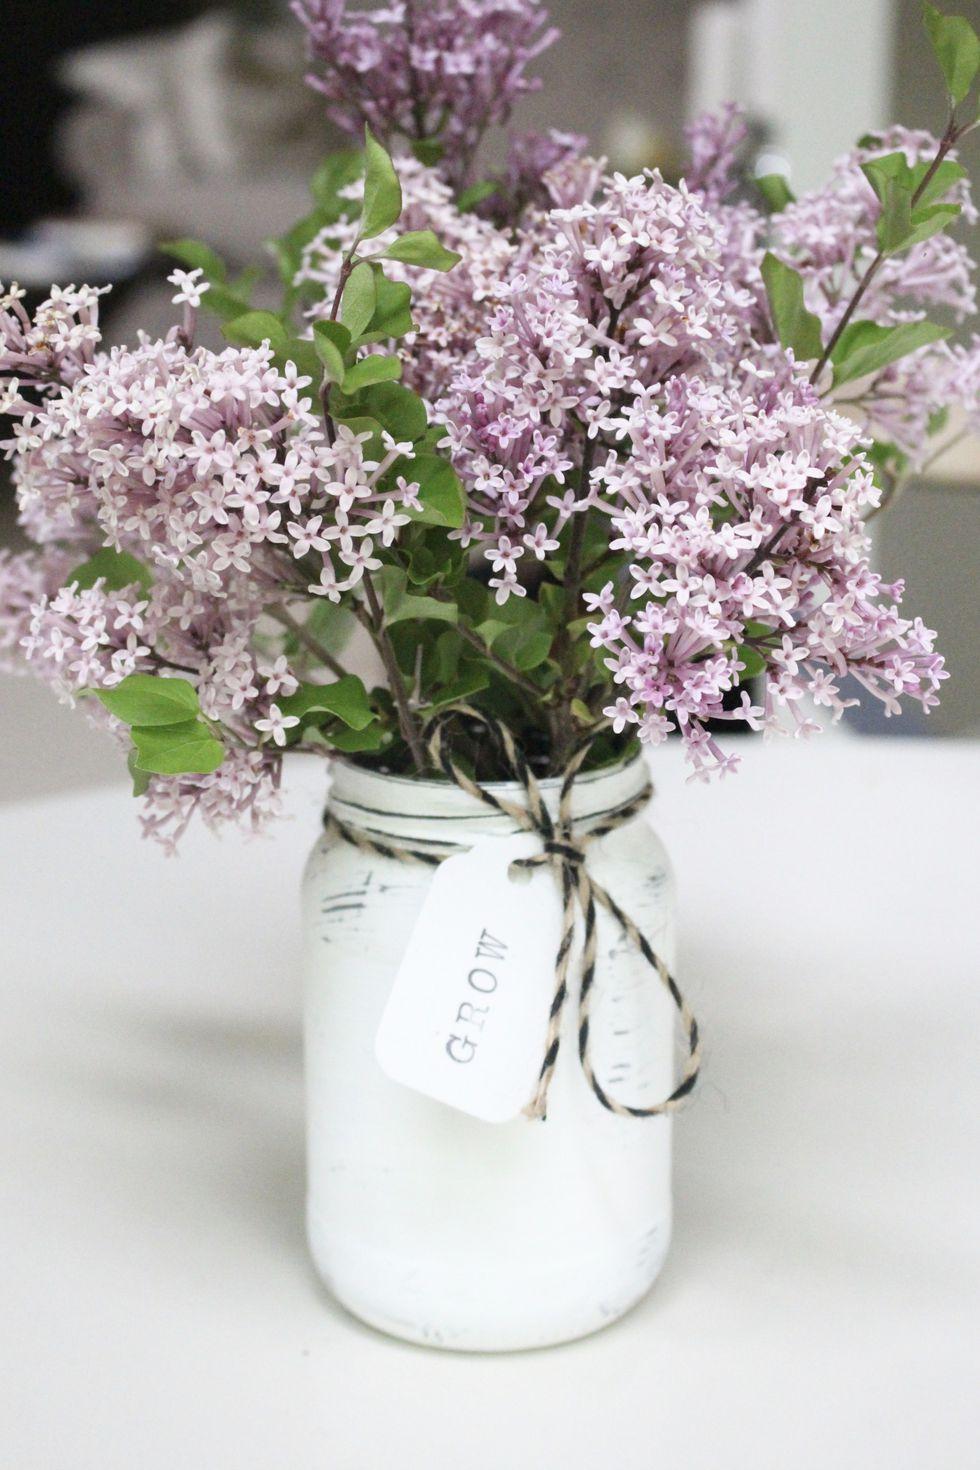 farmhouse-mason-jar-diy-flower-arrangement-1556719760